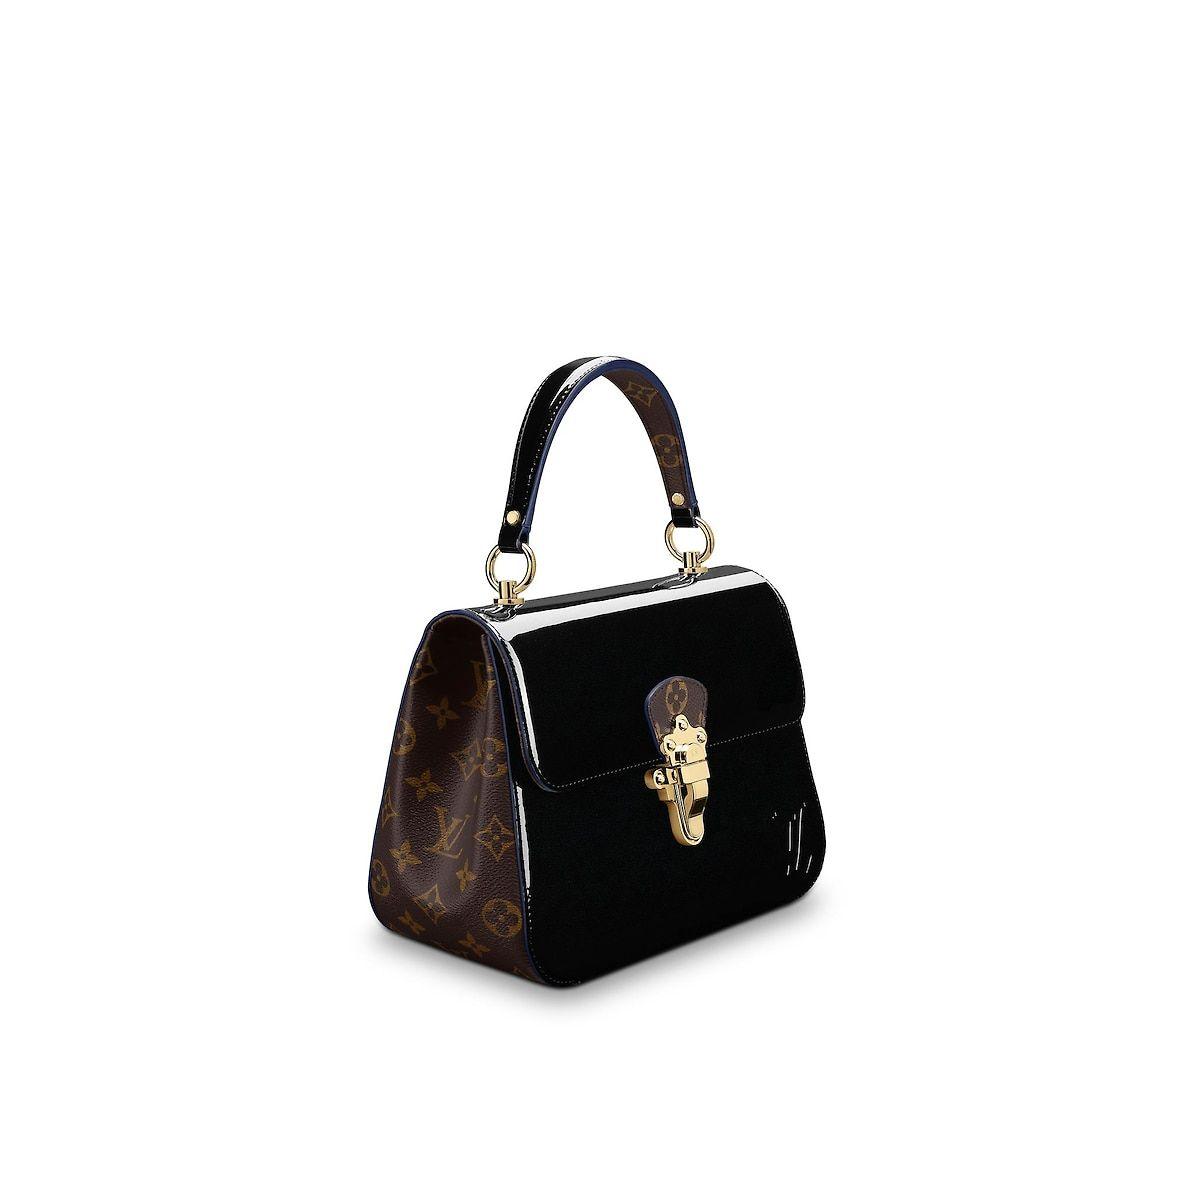 9542f55519c6 View 2 - Patent Leather HANDBAGS Top Handles Cherrywood PM